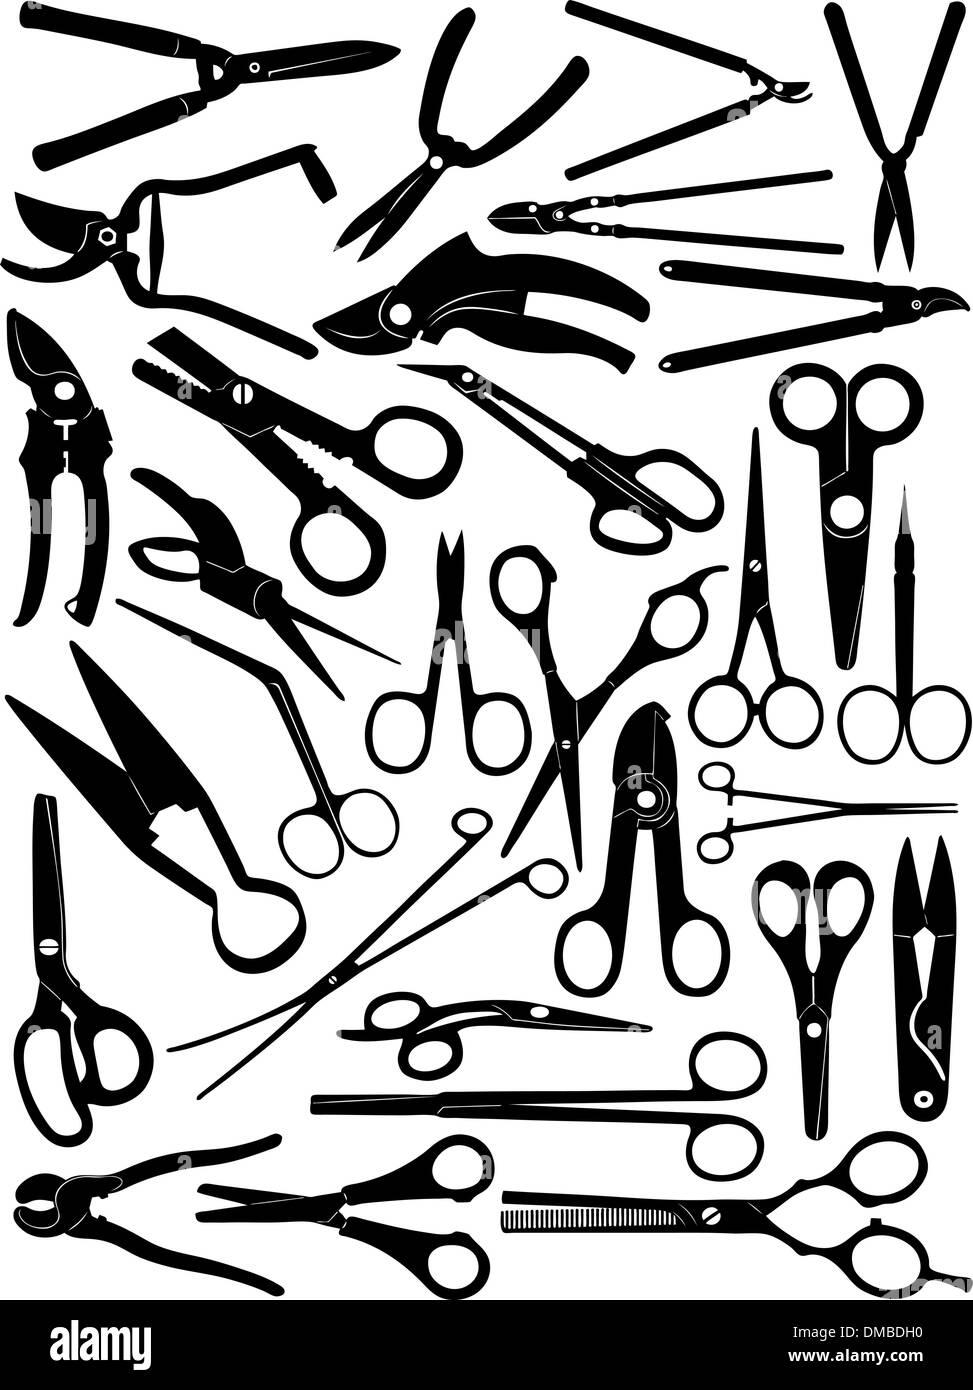 cut set stock photos cut set stock images alamy Panty Packing different scissors set stock image